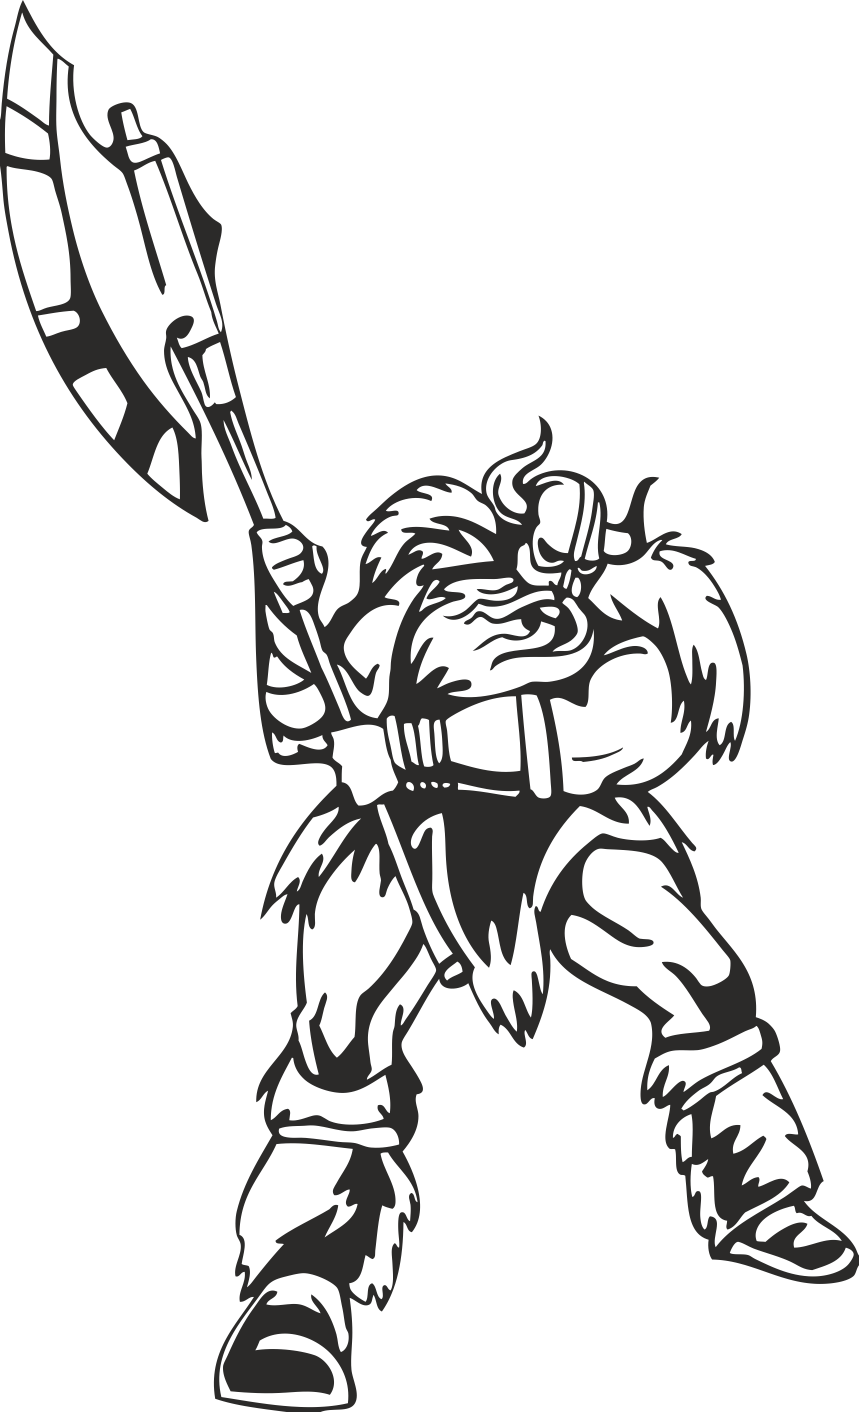 Warriors Vikings Vector 12 Free DXF File